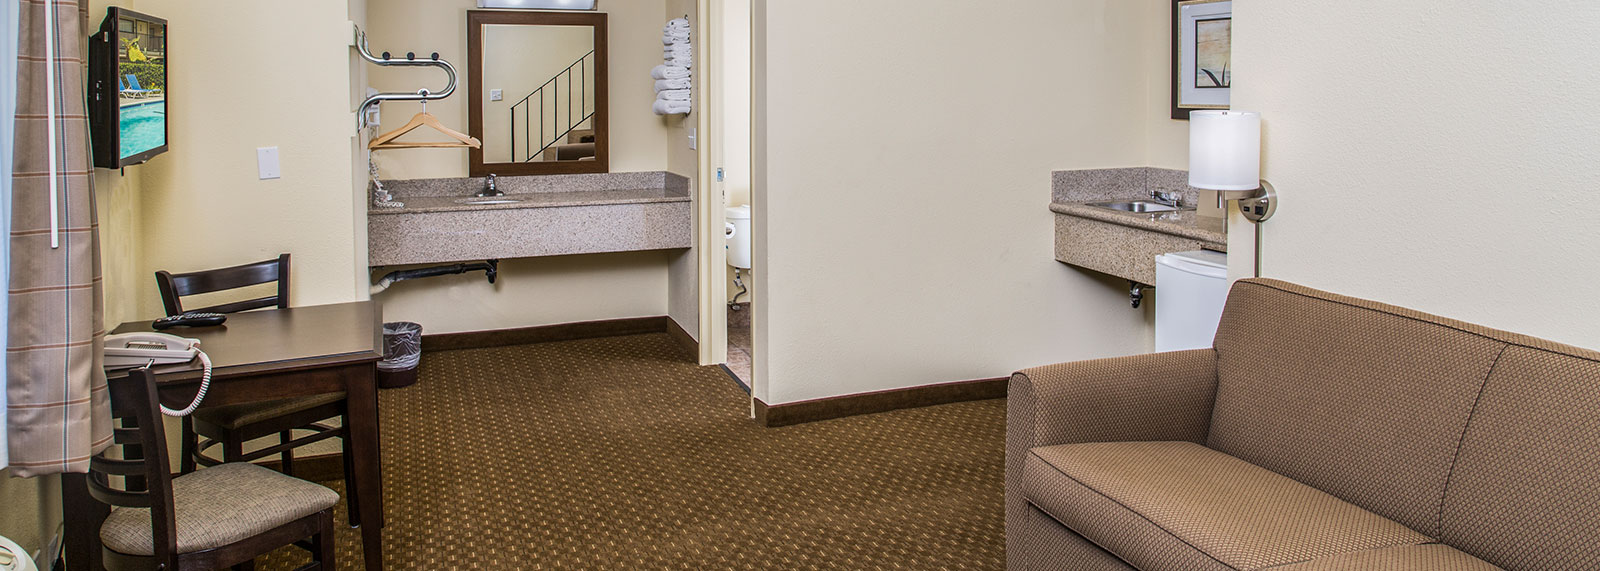 key-inn-and-suites-tustin-california-thanks-top